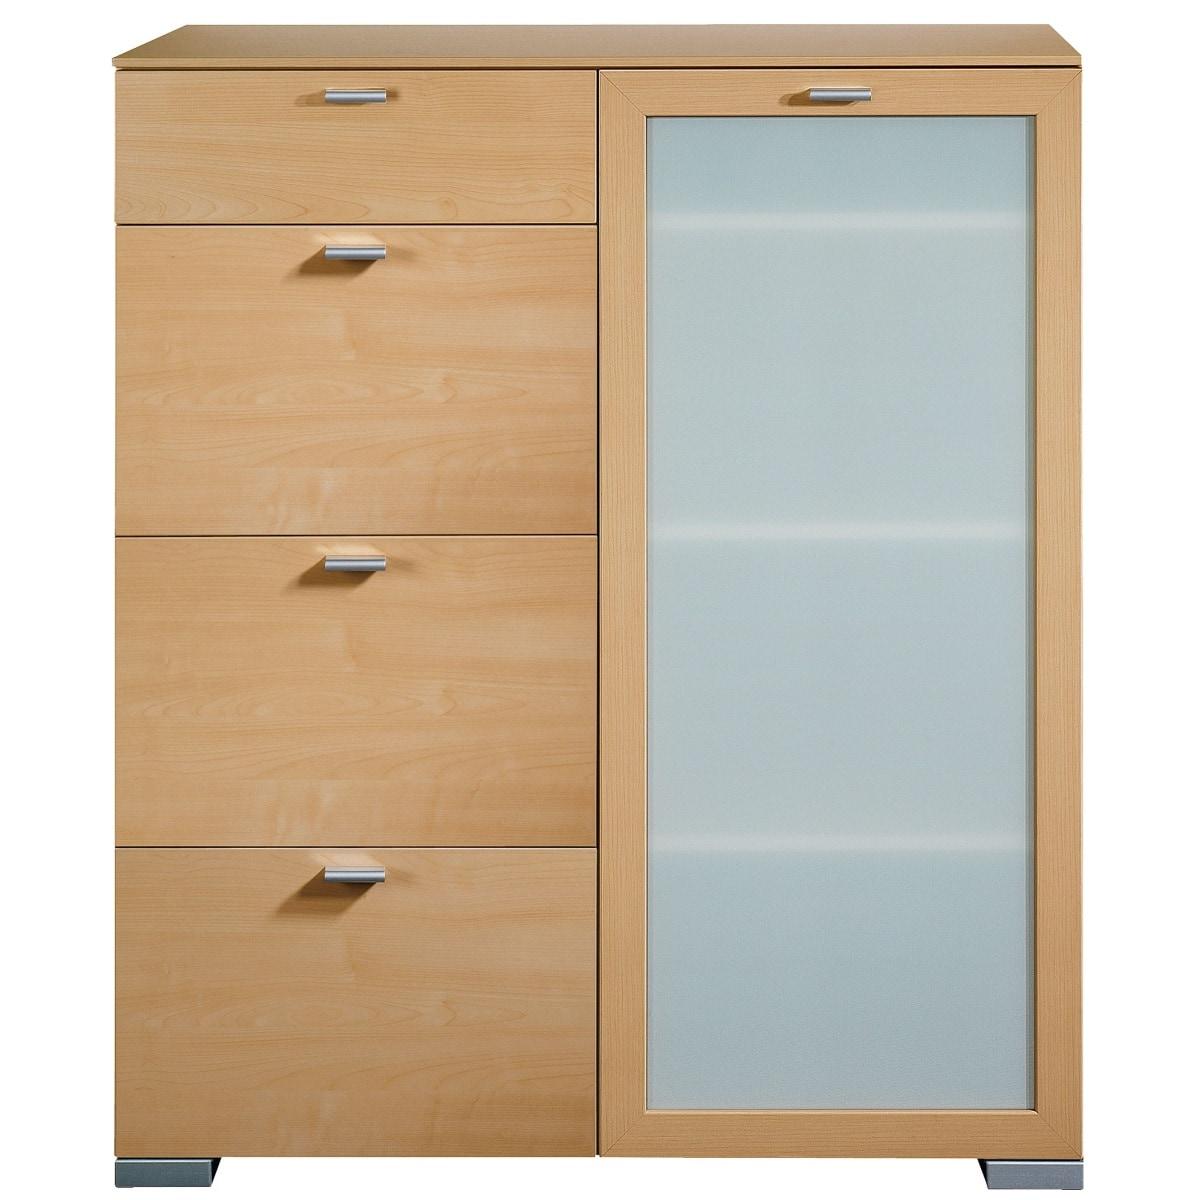 kommode buche hell ikea malm kommode mit spiegel best ikea malm kommode ideas on with kommode. Black Bedroom Furniture Sets. Home Design Ideas